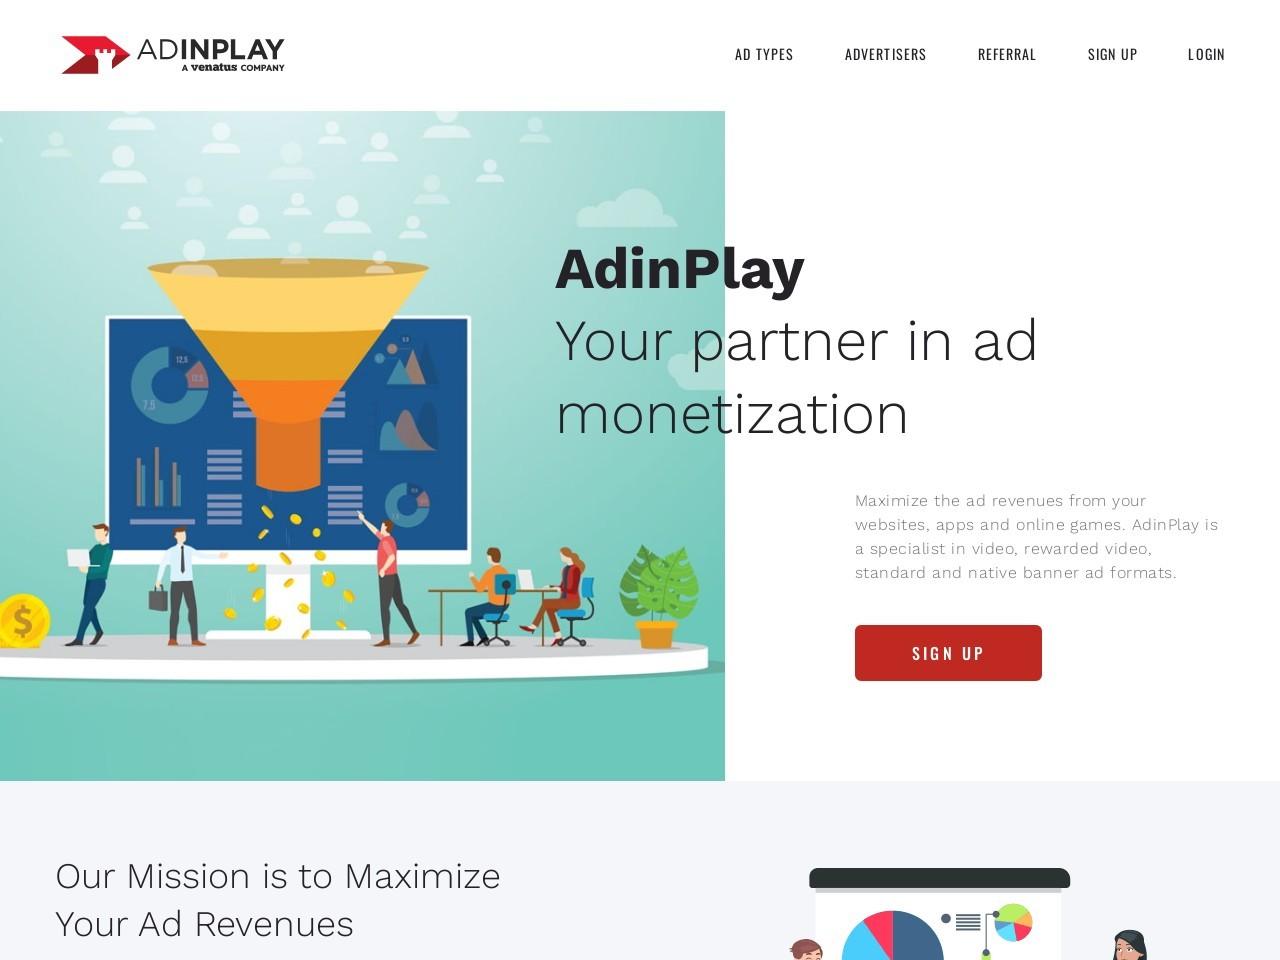 AdinPlay